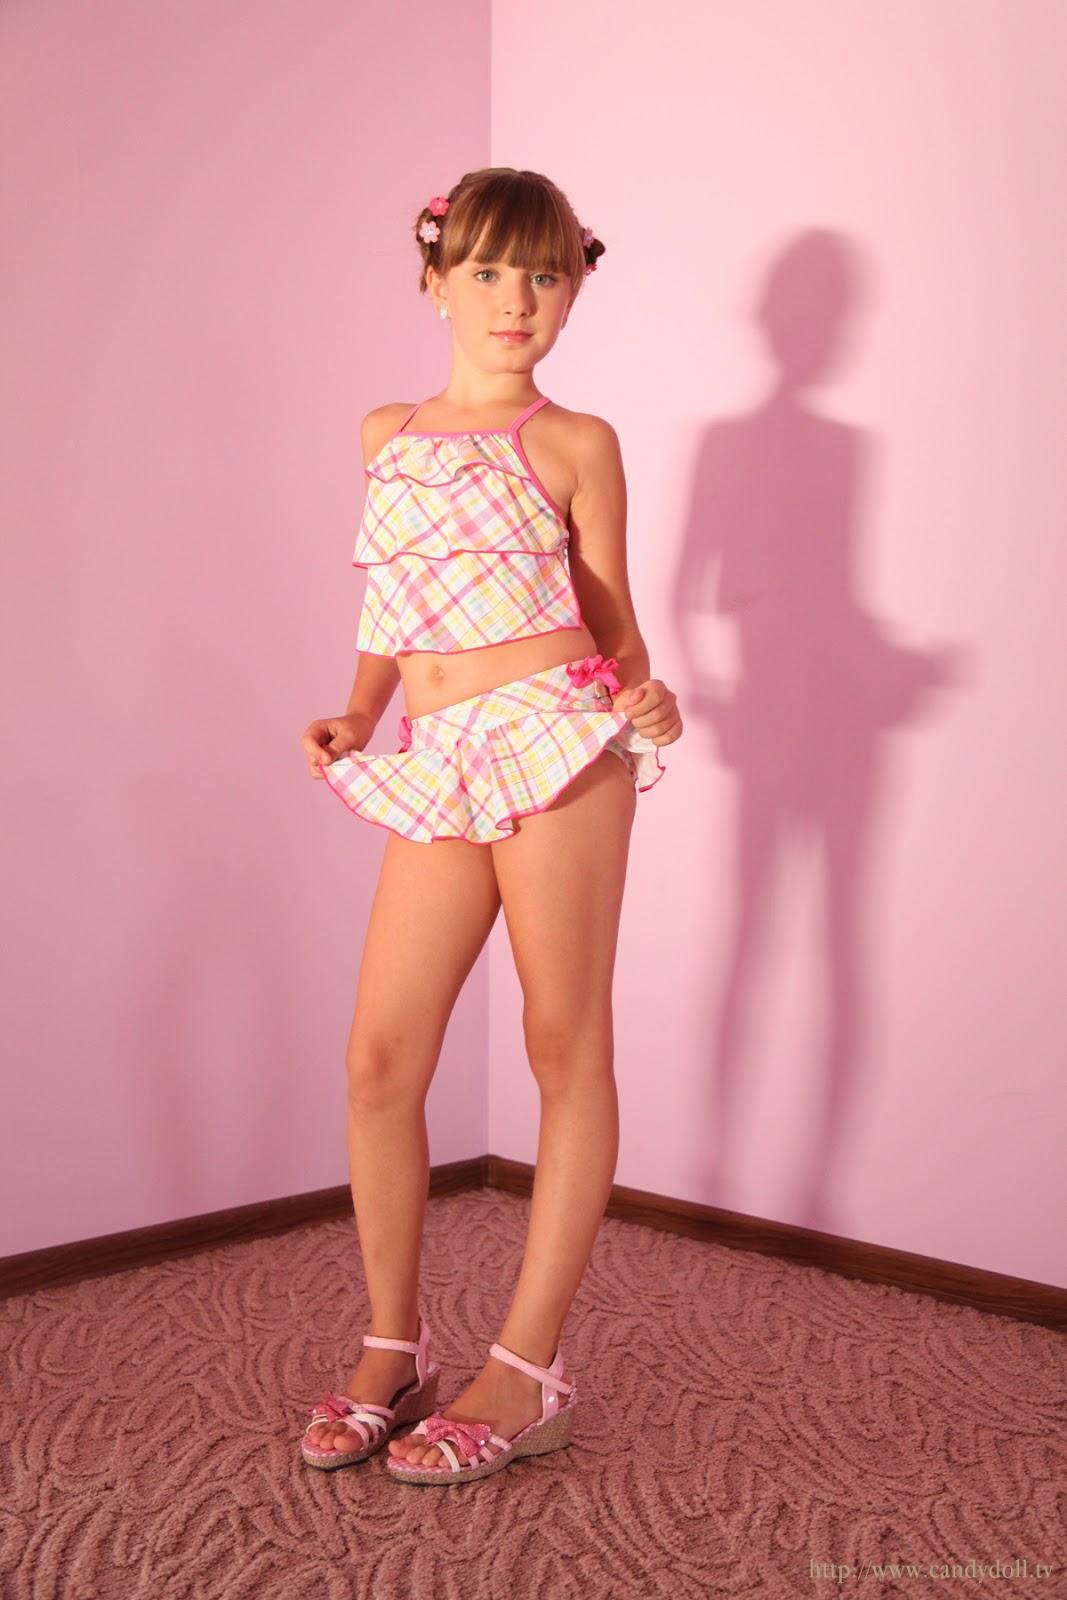 foro sandrita teen model lolita: